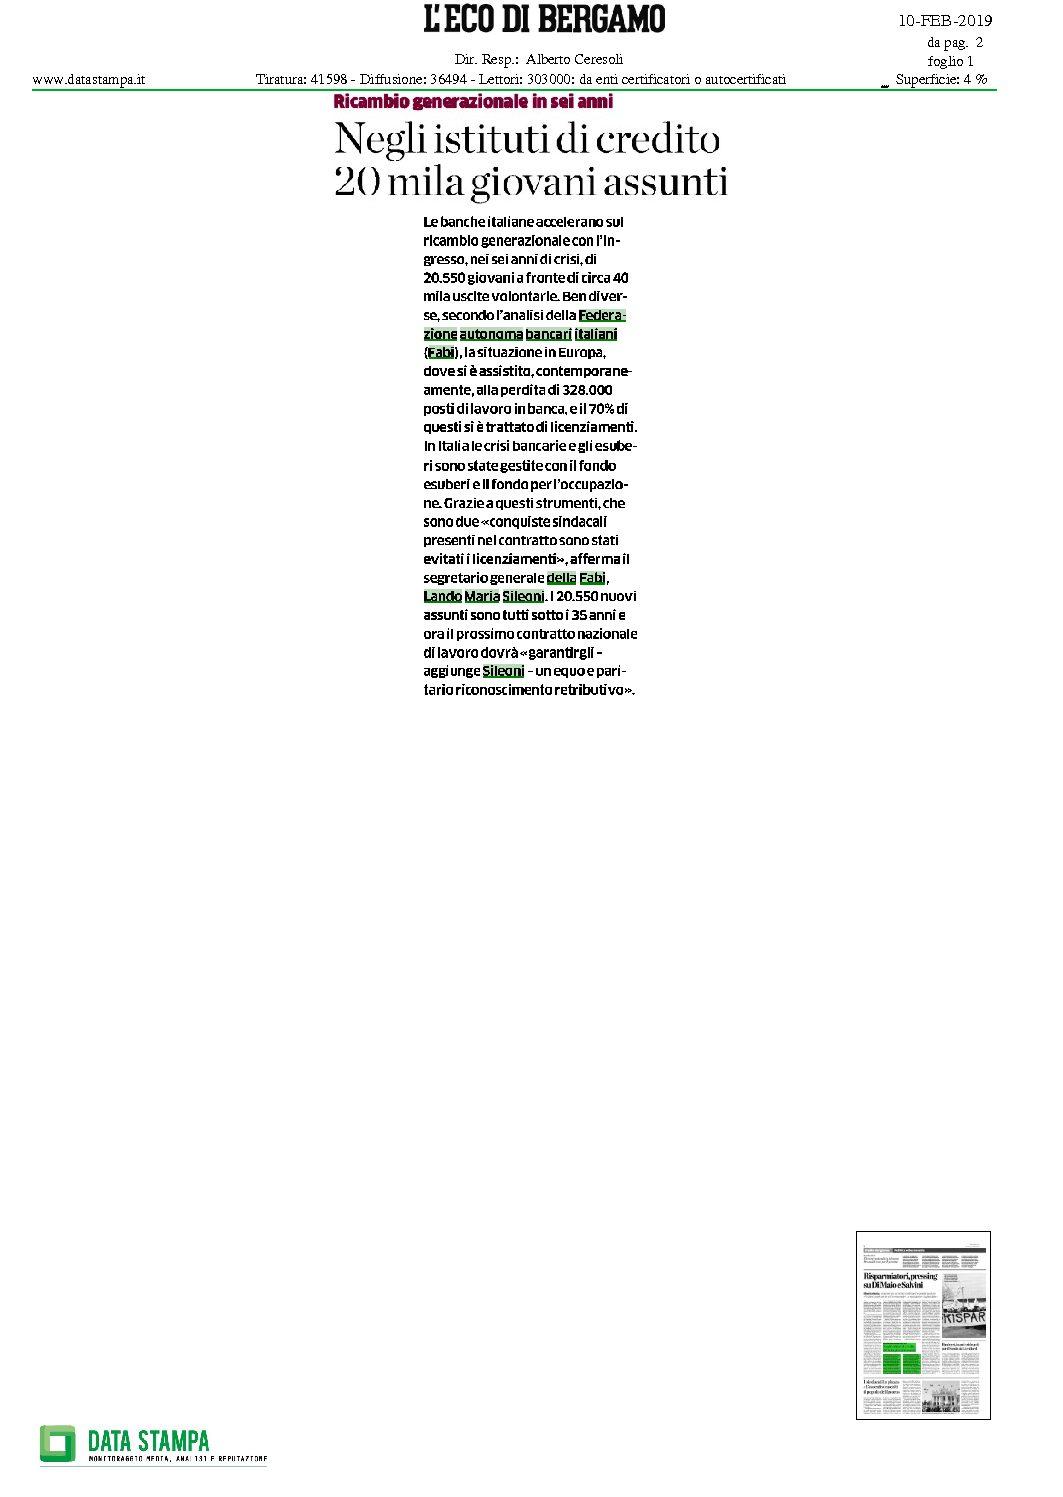 ECODIBERGAMO_100219_PDF